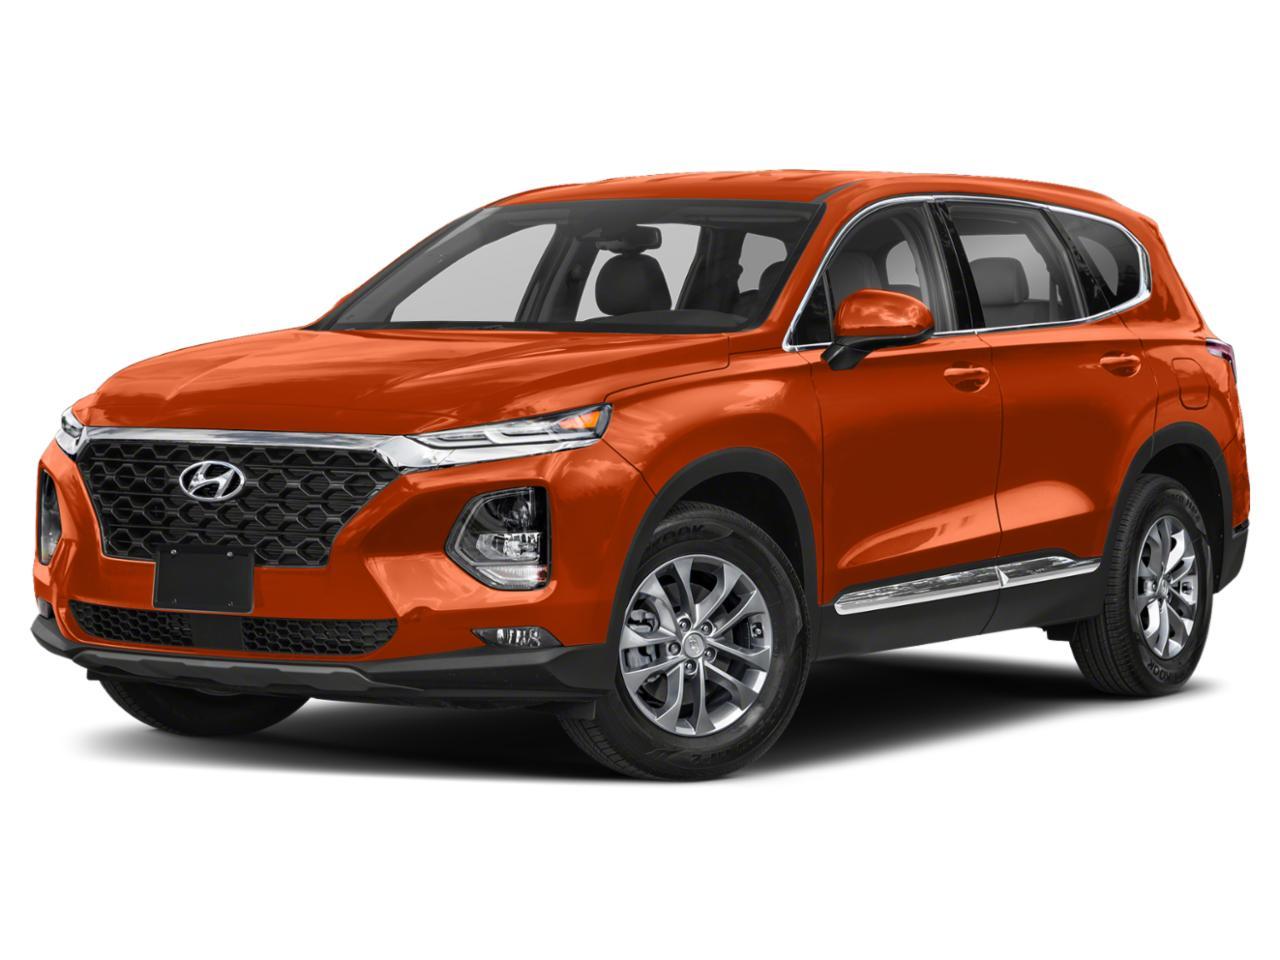 2020 Hyundai Santa Fe Vehicle Photo in Plainfield, IL 60586